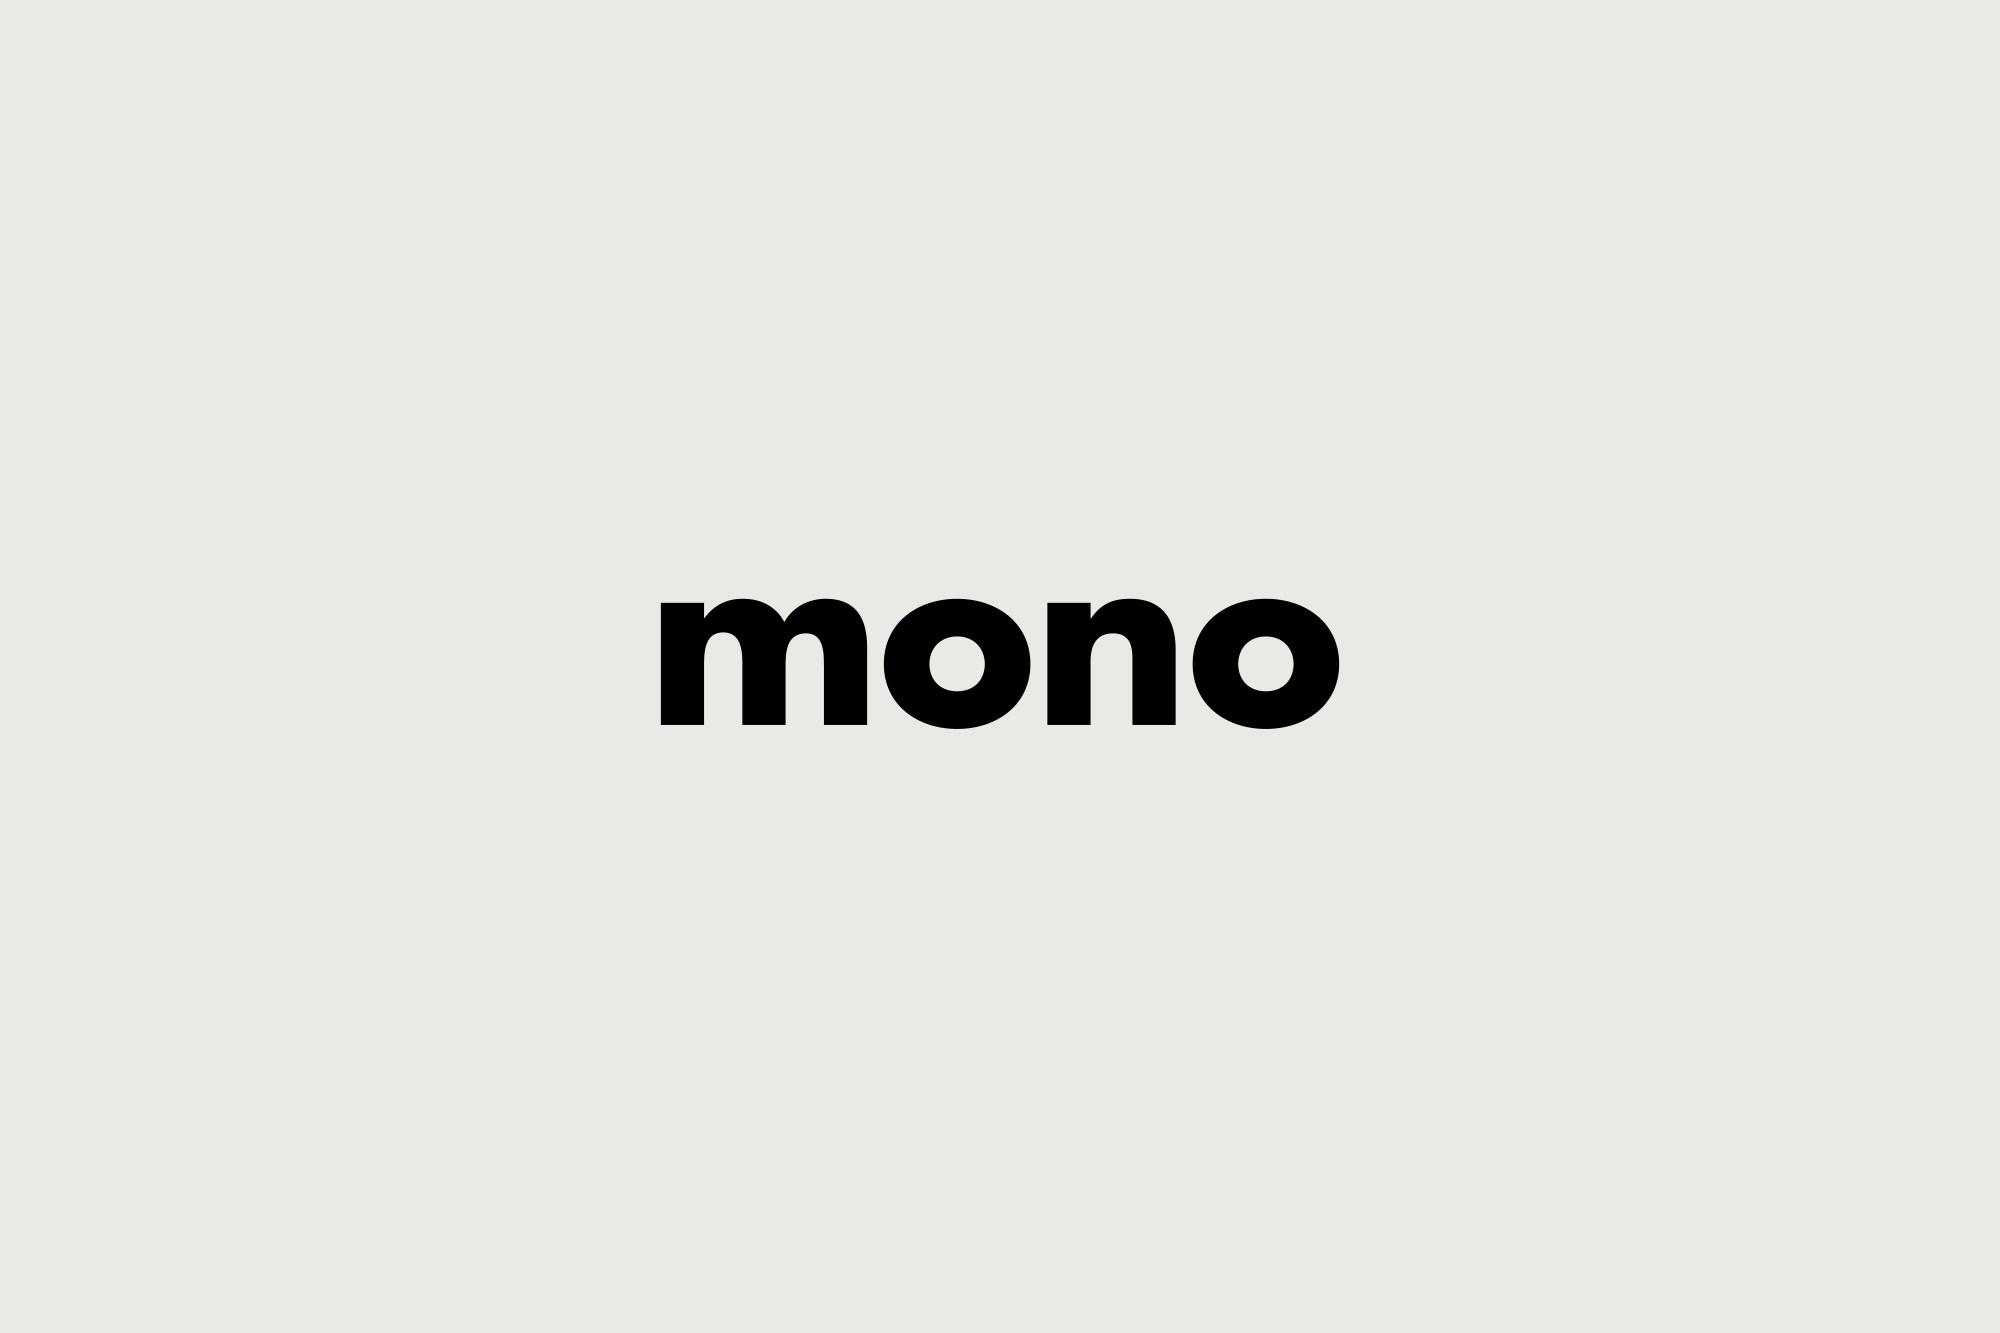 Mono PB0110 Logo 01